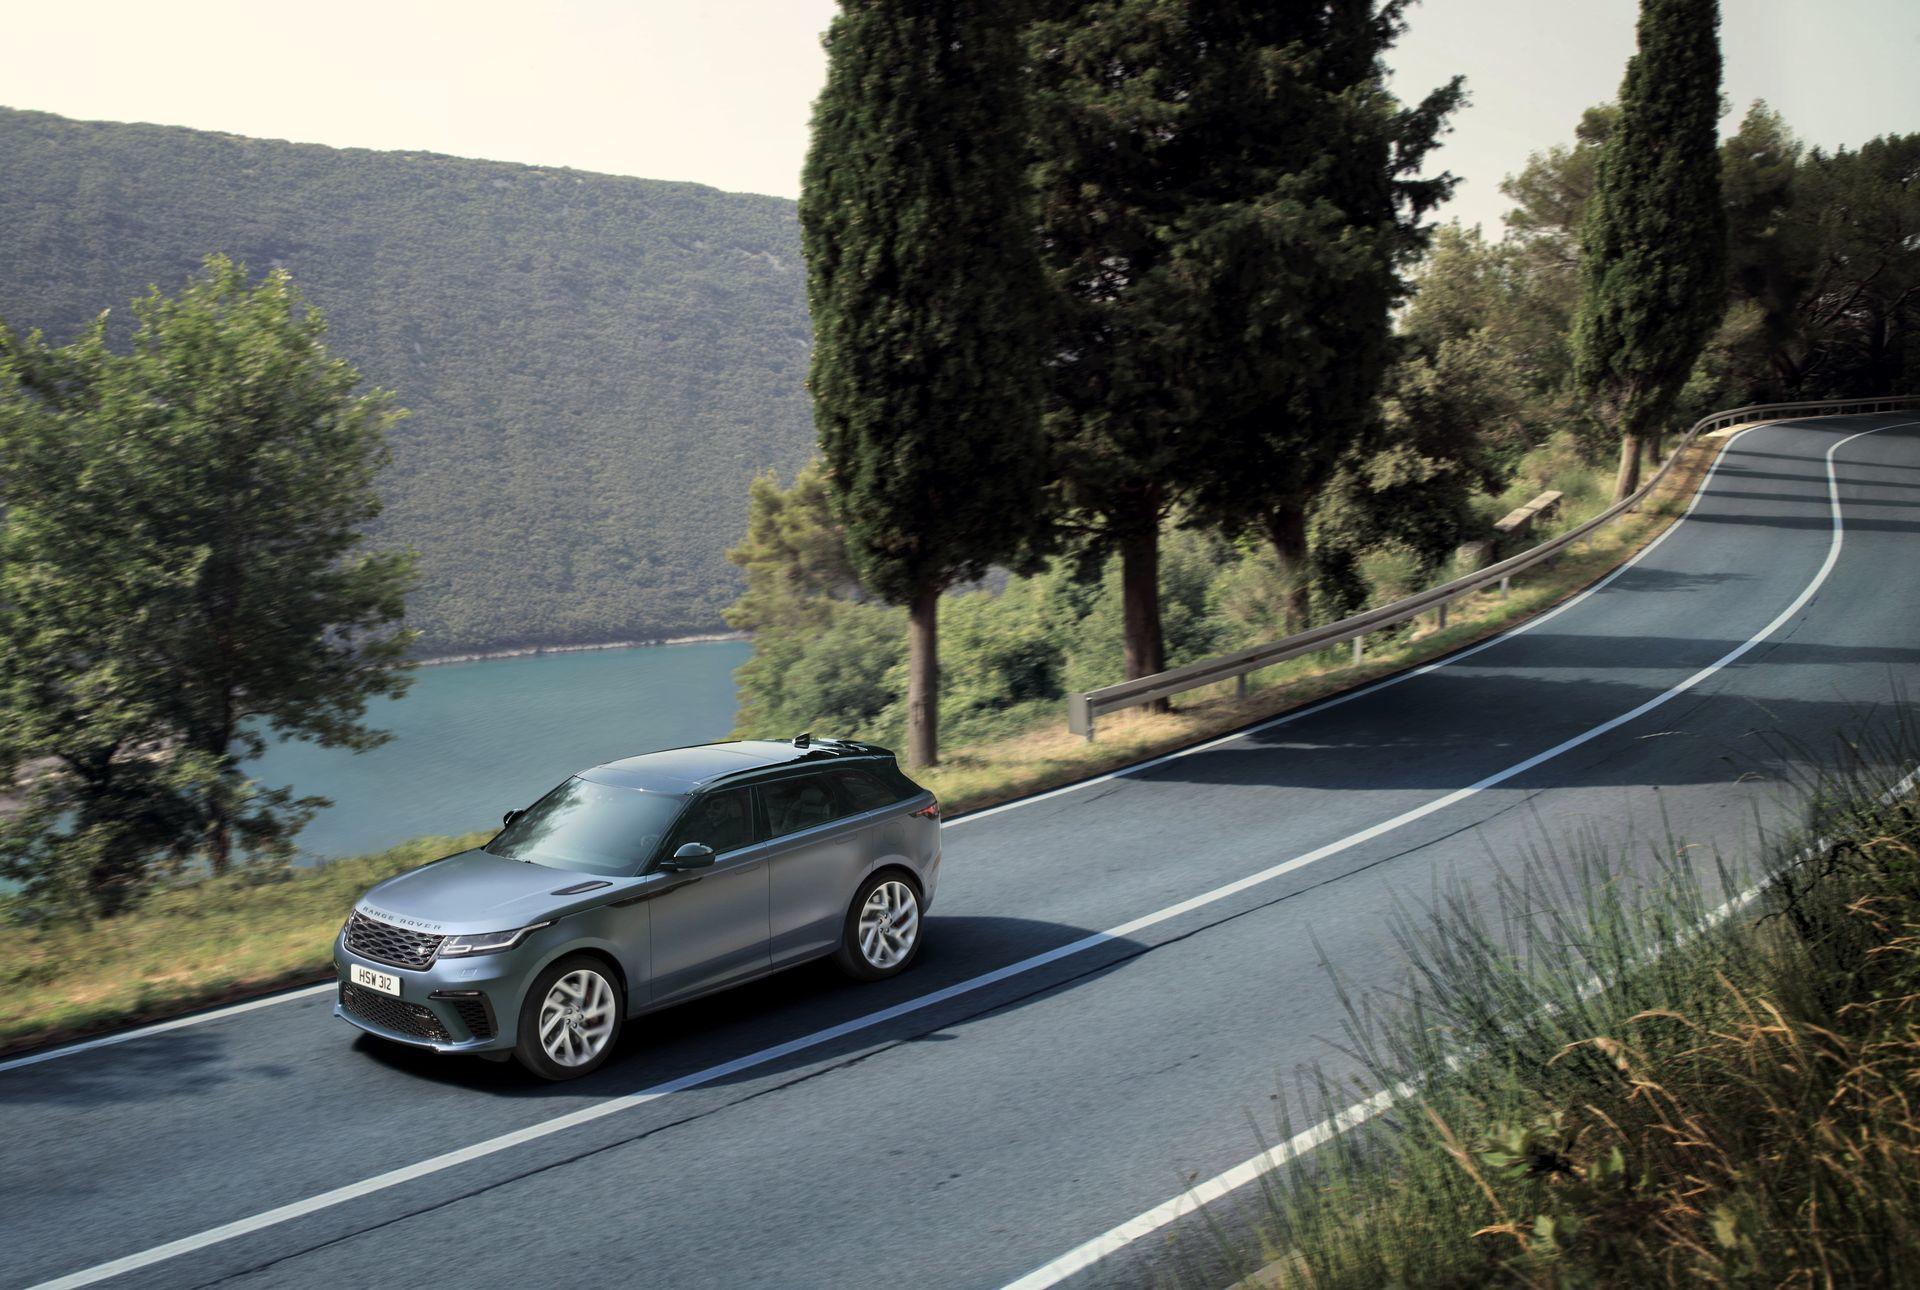 Range Rover Velar Svautobiography 23